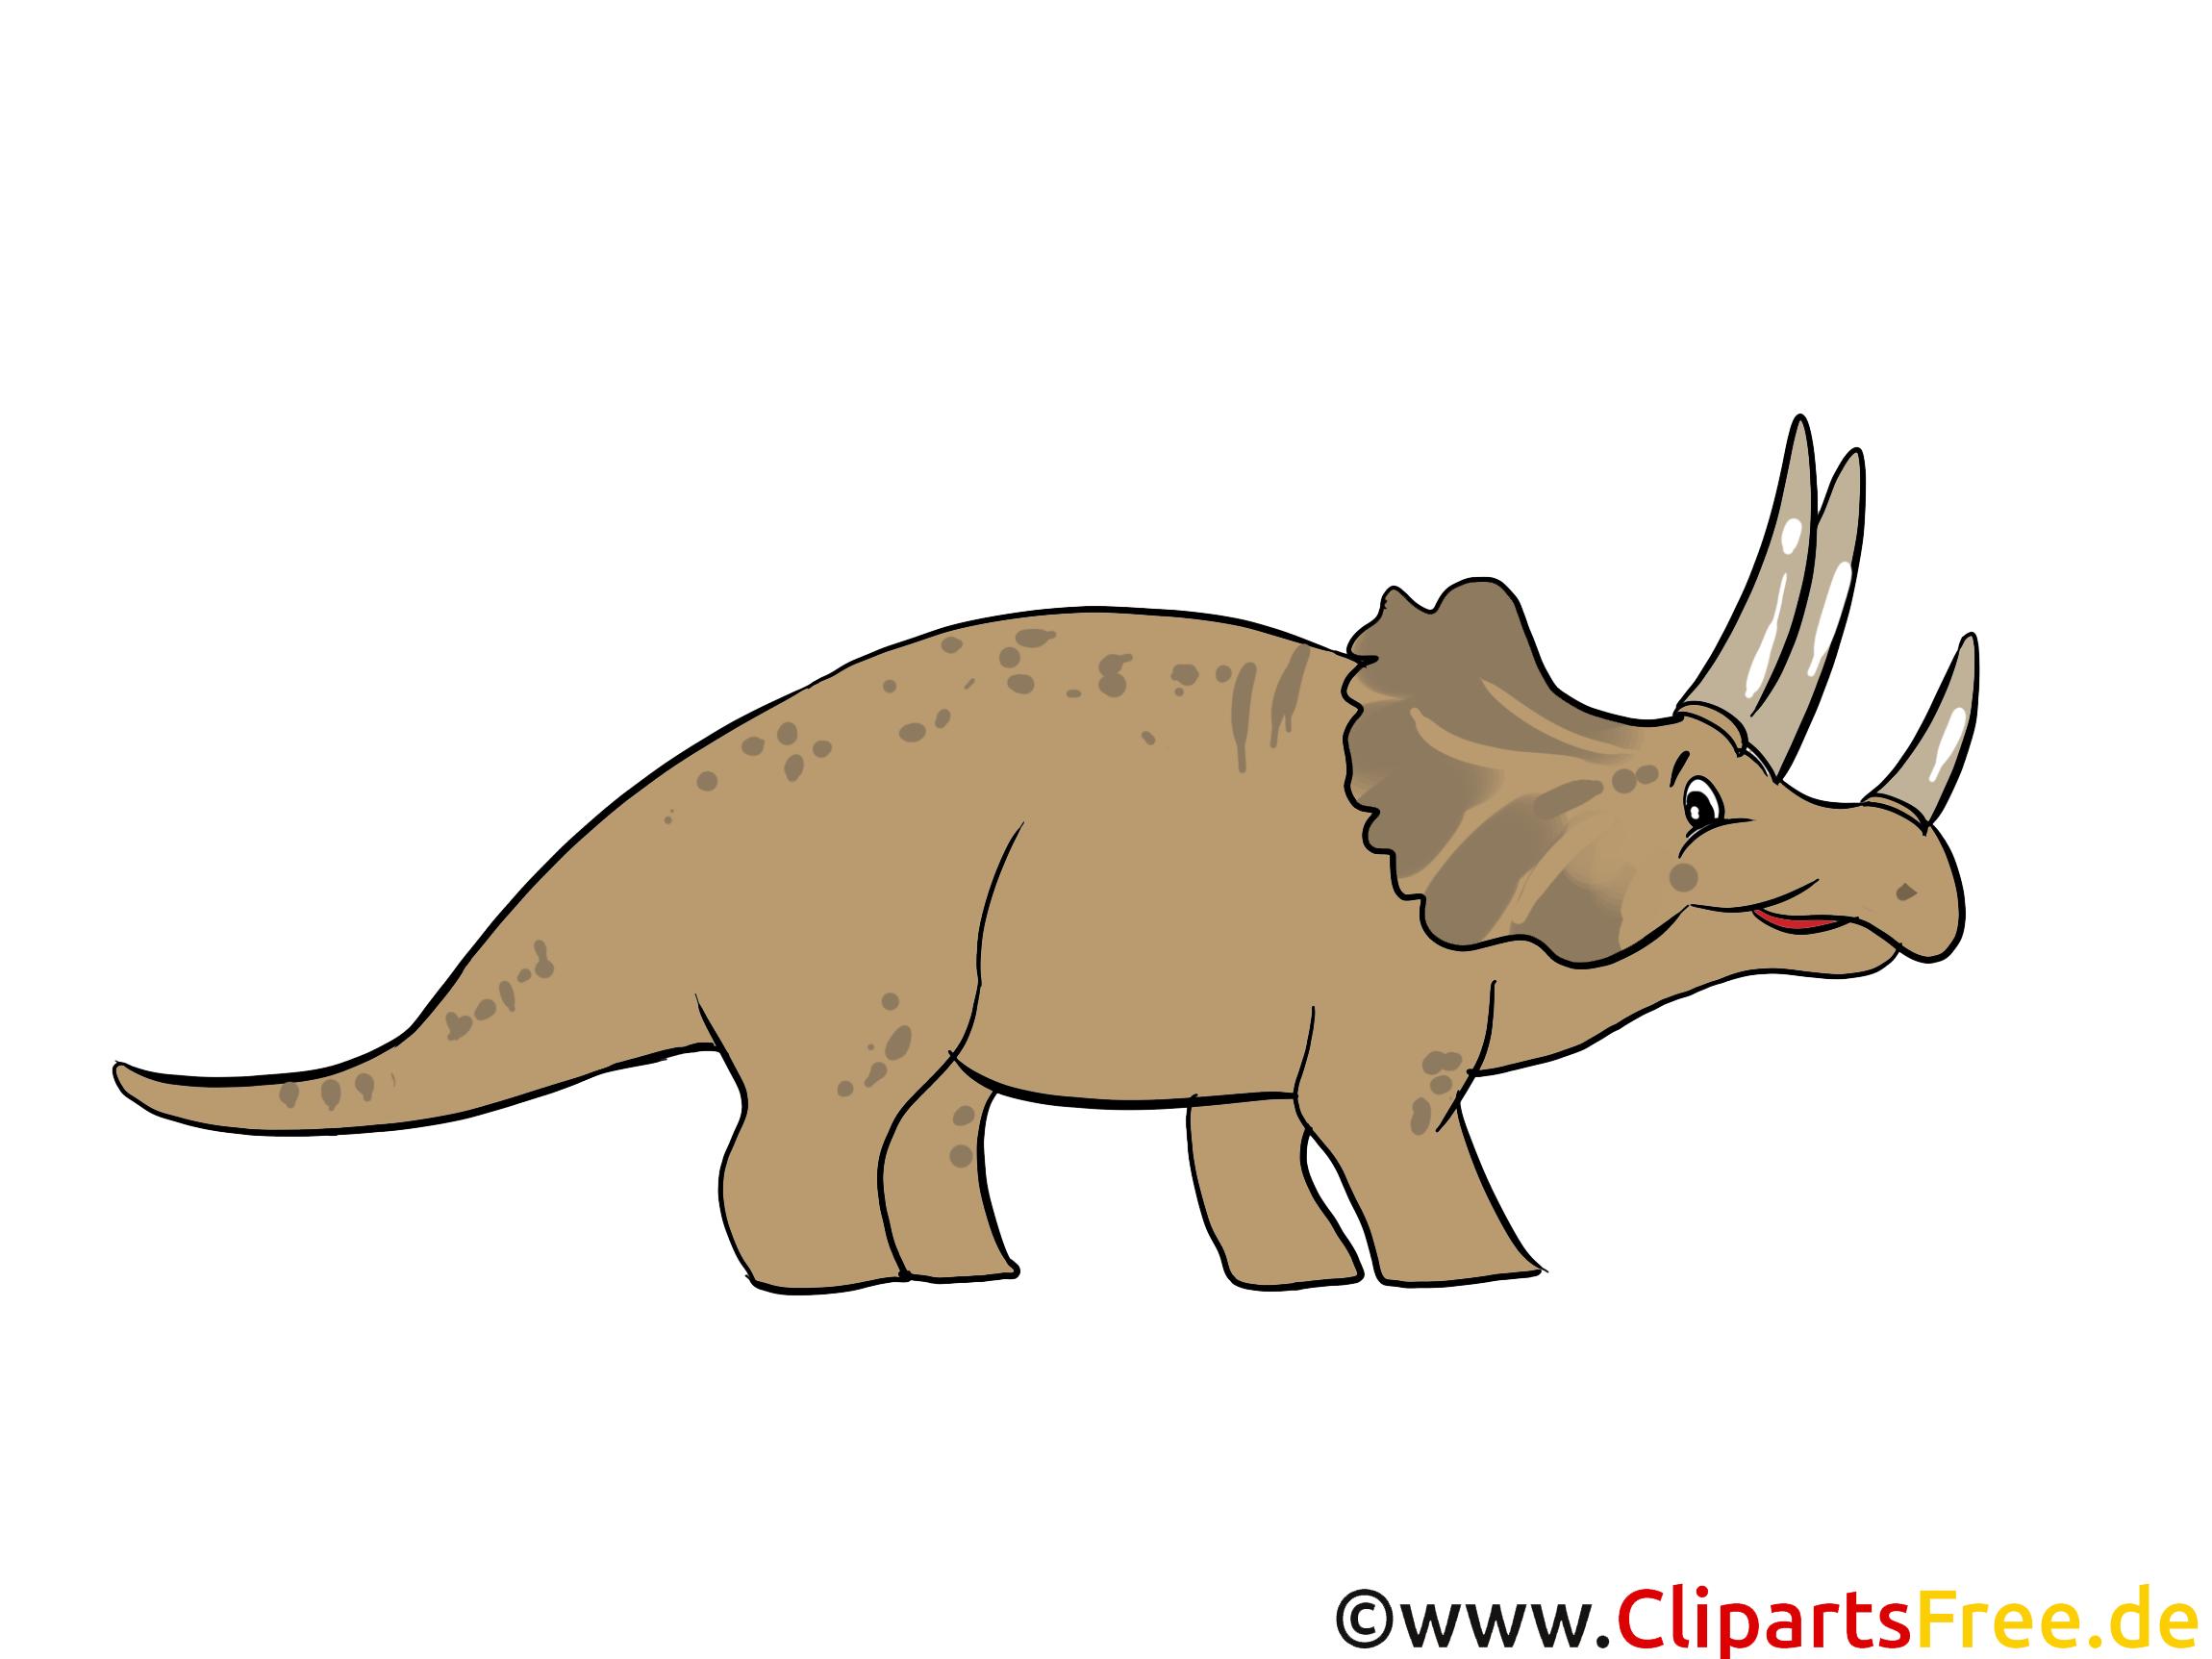 Ceratopsidae afbeelding - Dinosaur soorten foto's, tekenfilms, gratis illustraties